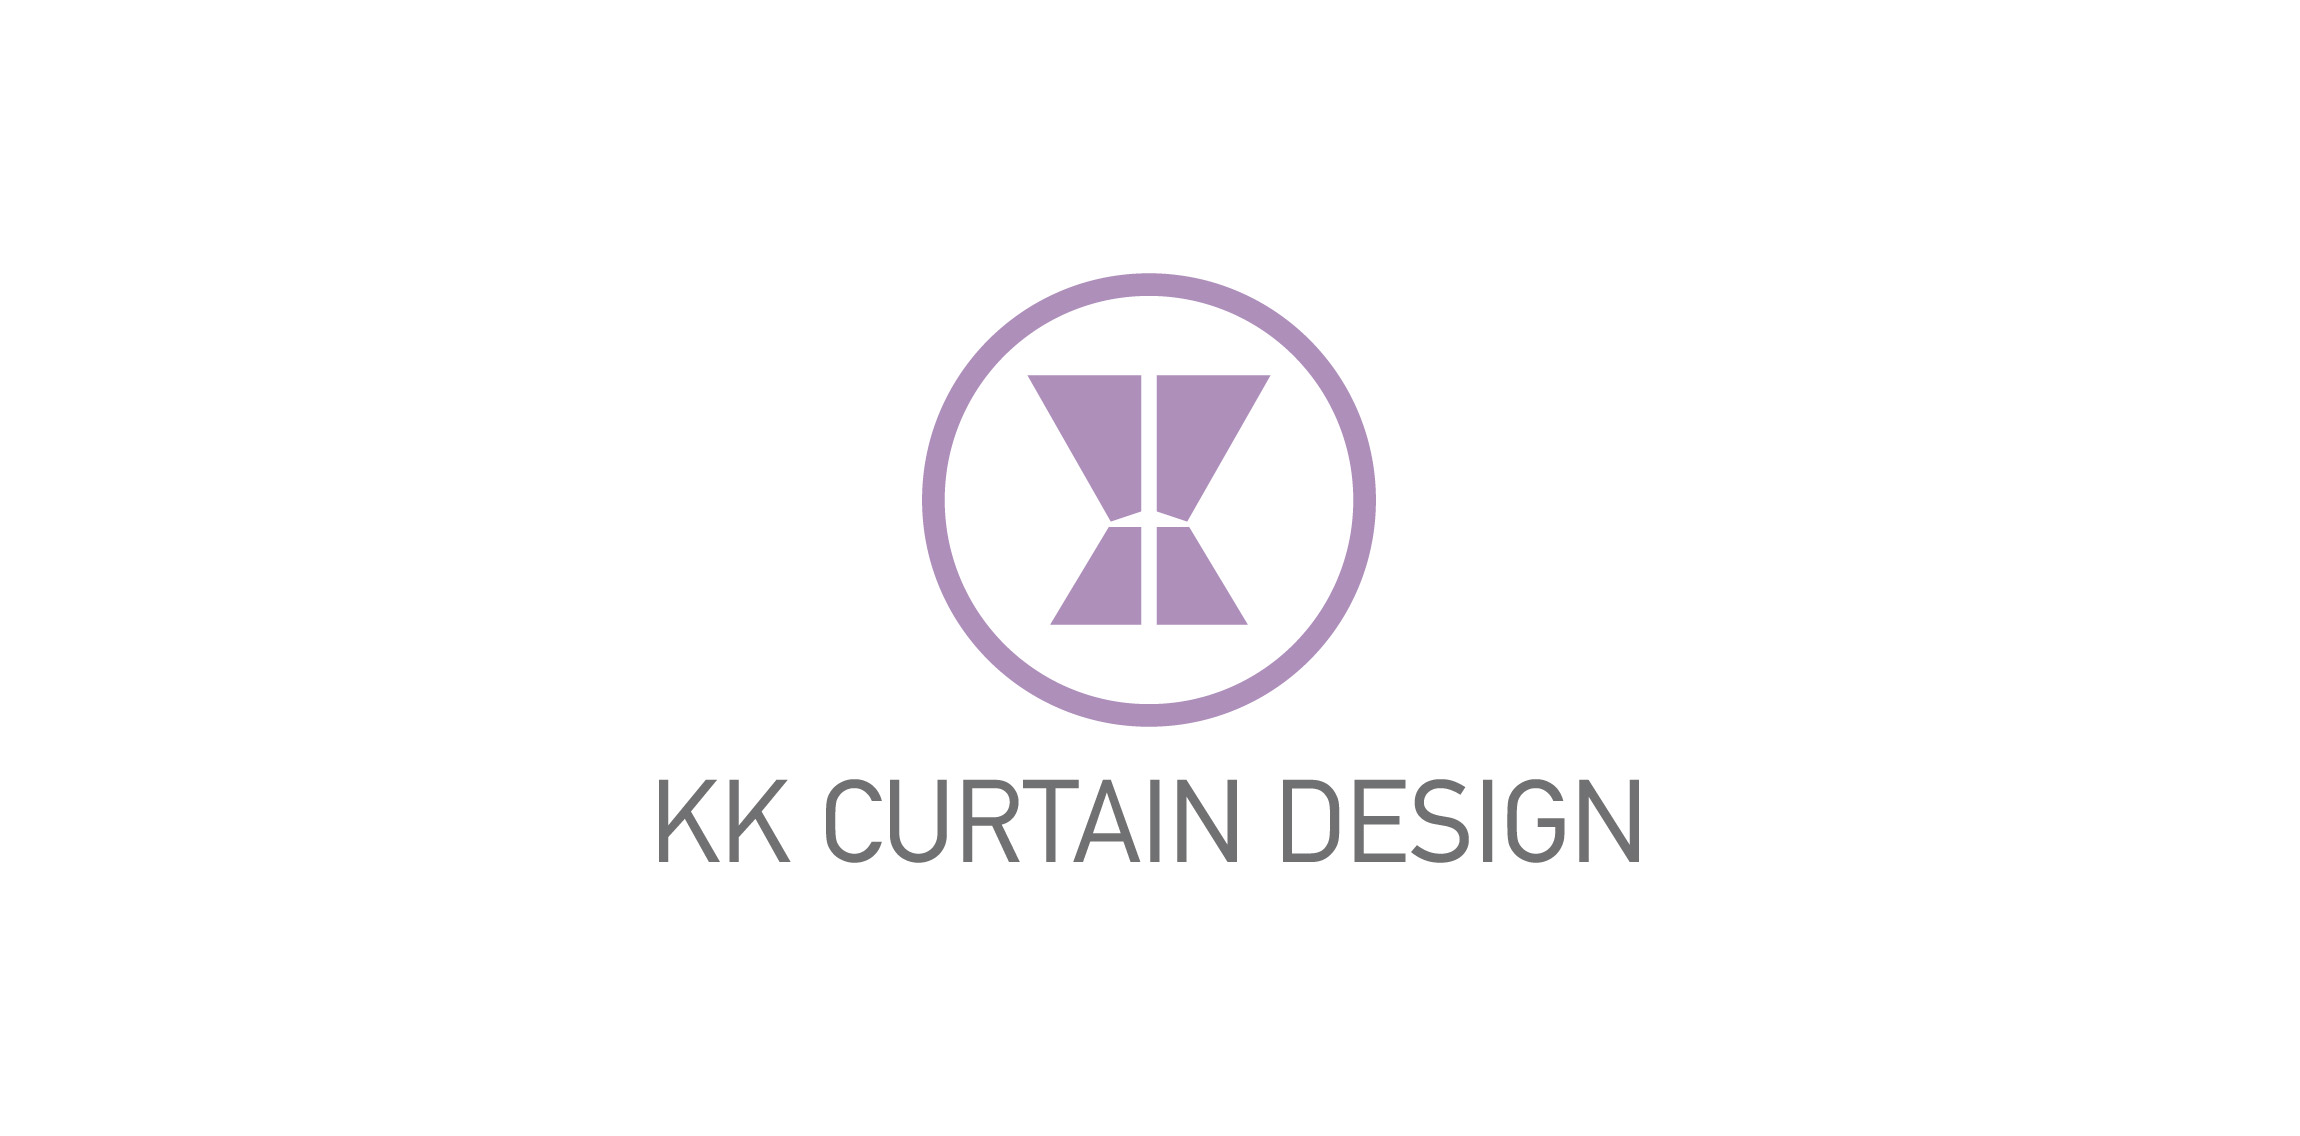 KK Curtain Design